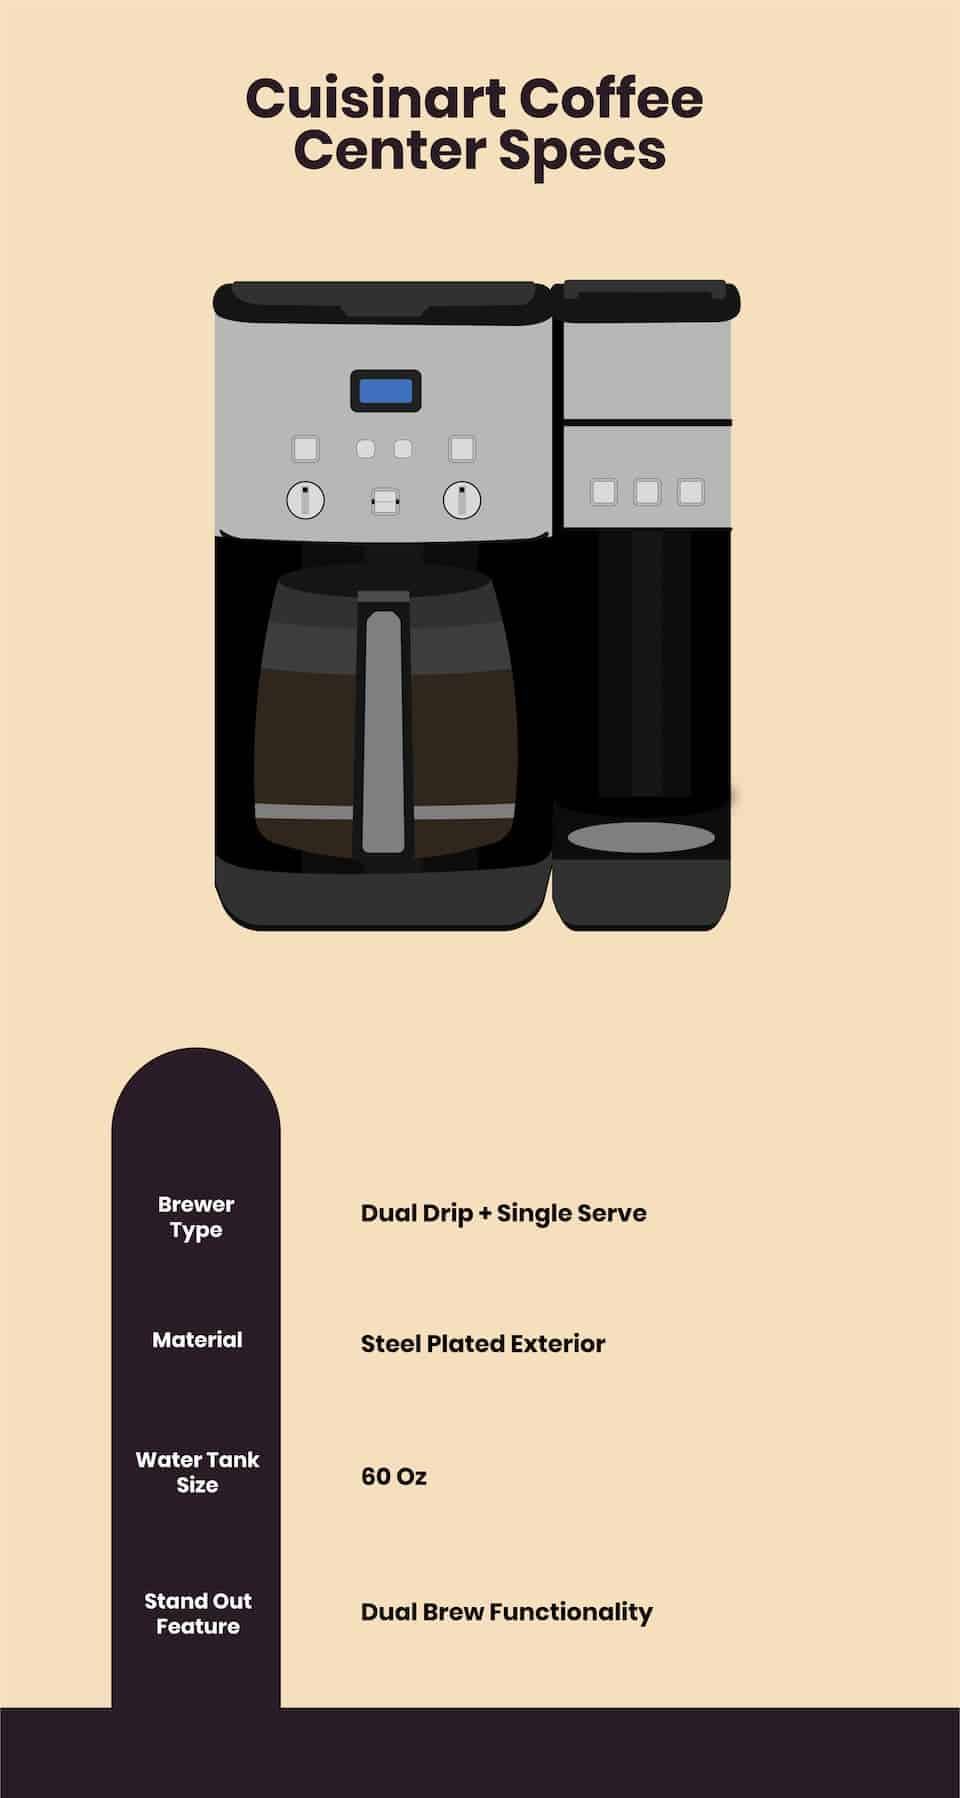 Cuisinart coffee center infographic